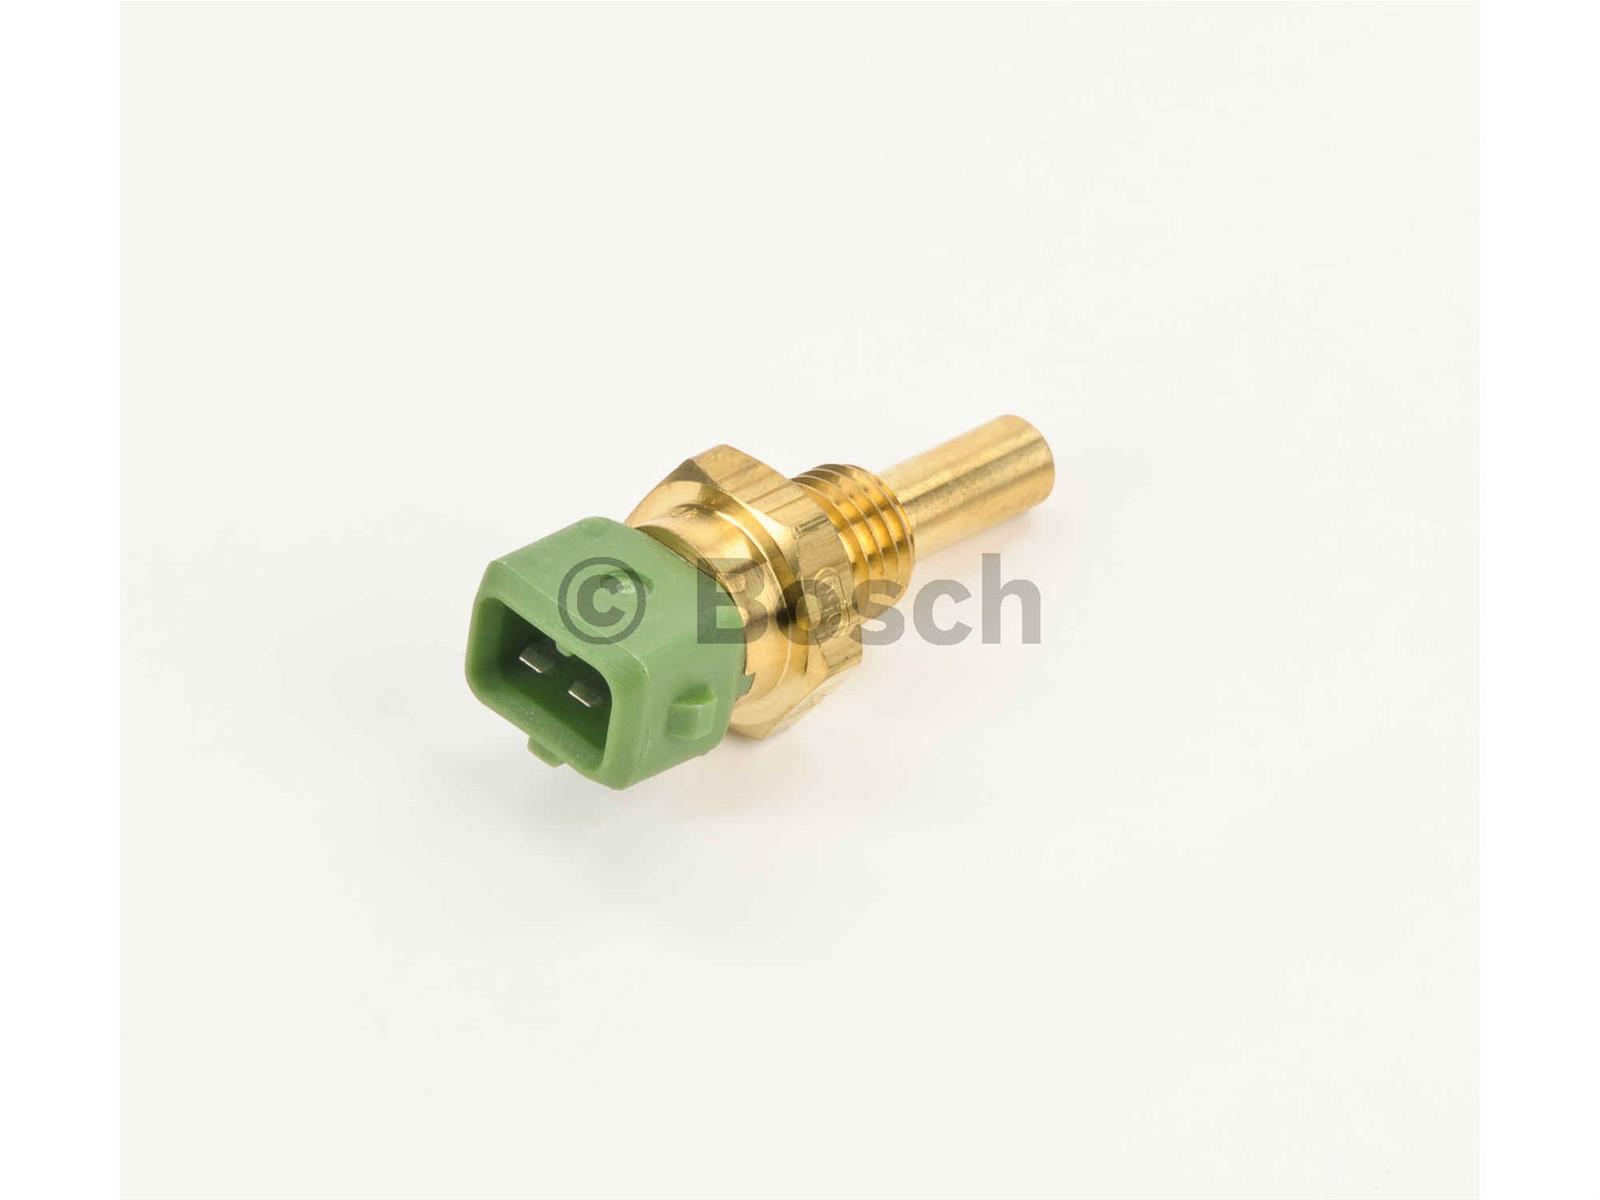 Bosch 0280130055 Engine Coolant Temperature Sensor Bosch Coolant Temperature Sensor